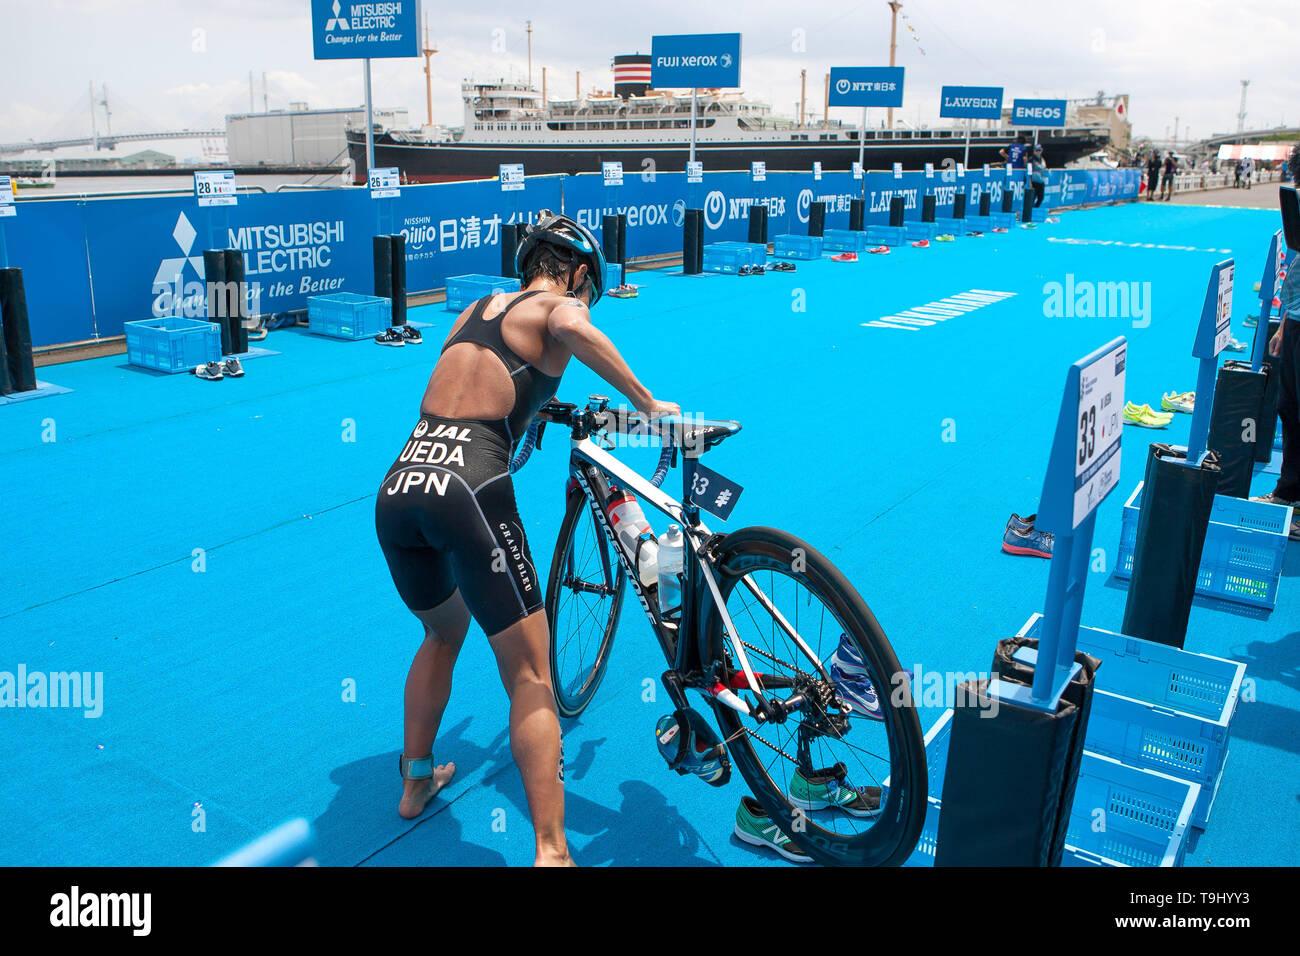 Yokohama, Japan. 18th May, 2019. 2019 ITU World Triathlon, World Paratriathlon Yokohama at Yamashita Park and Minato Mirai, Yokohama. Ueda (Photos by Michael Steinebach/AFLO) Credit: Aflo Co. Ltd./Alamy Live News Stock Photo